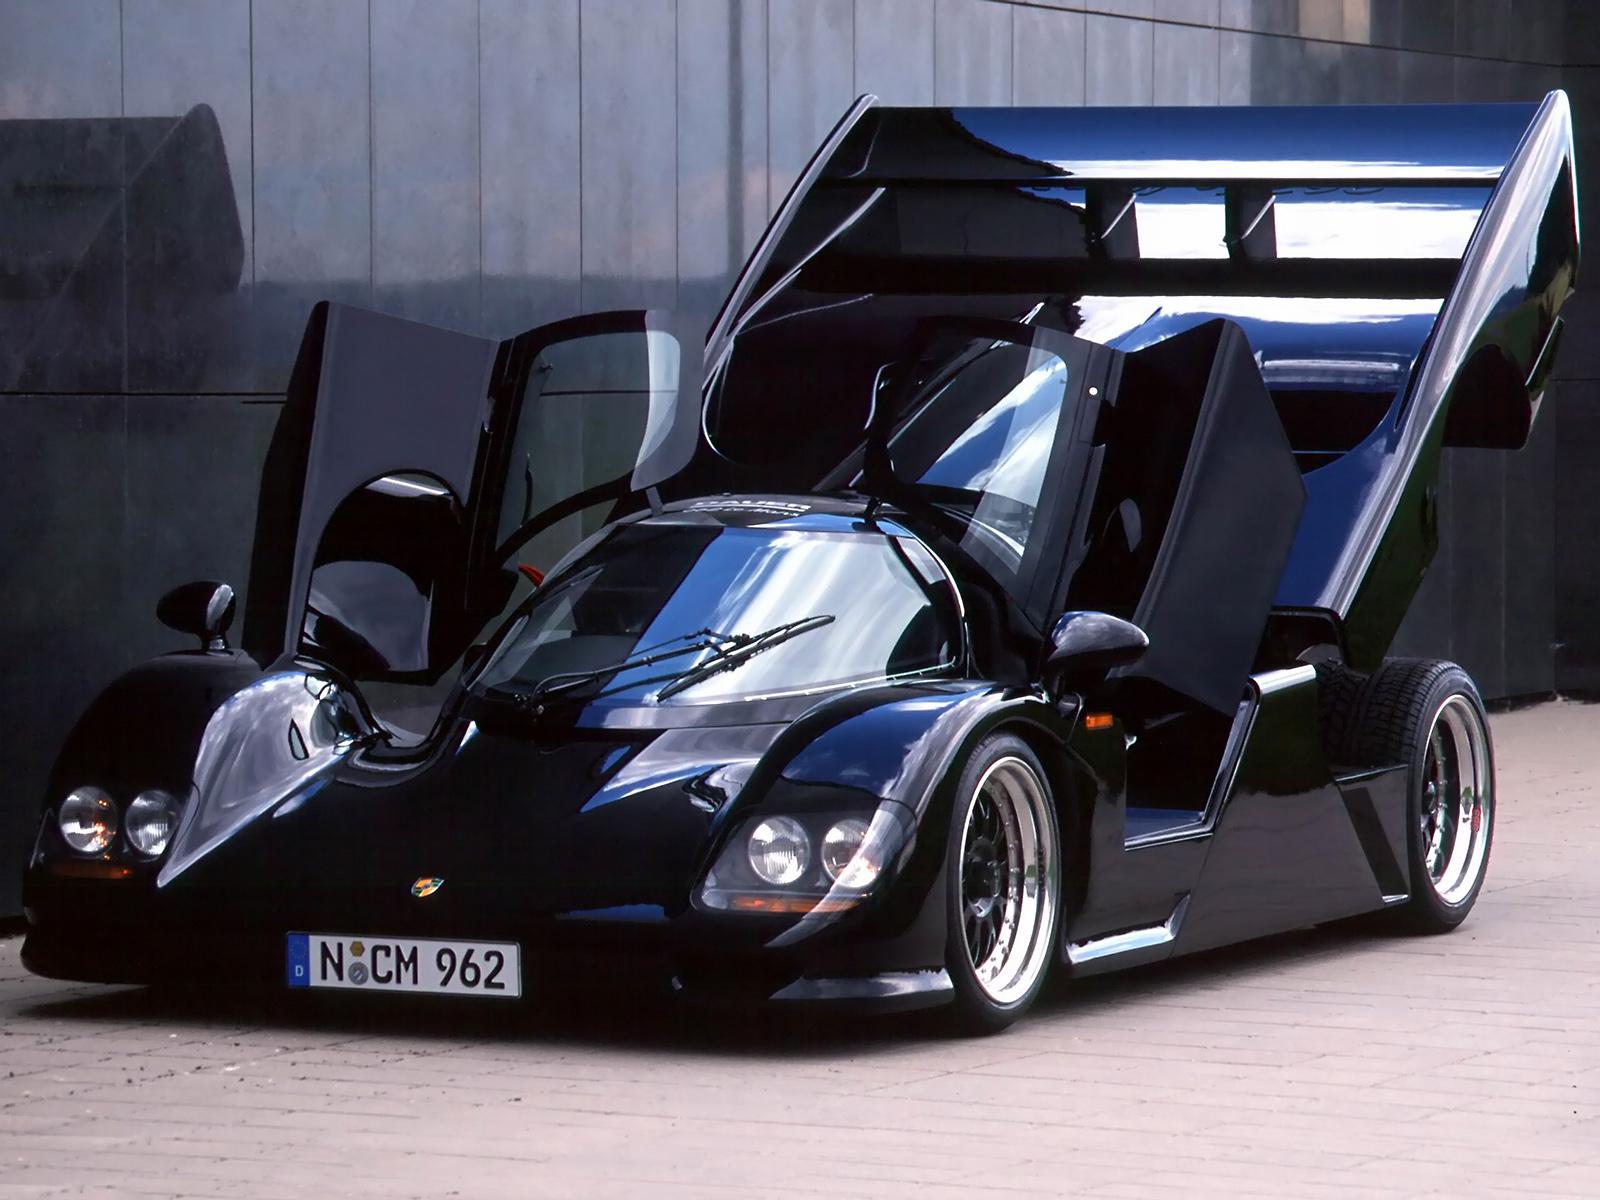 Abu Dhabi Envy: Sultan Hassanal Bolkiah's Top 11 Exotic Cars - Page ...